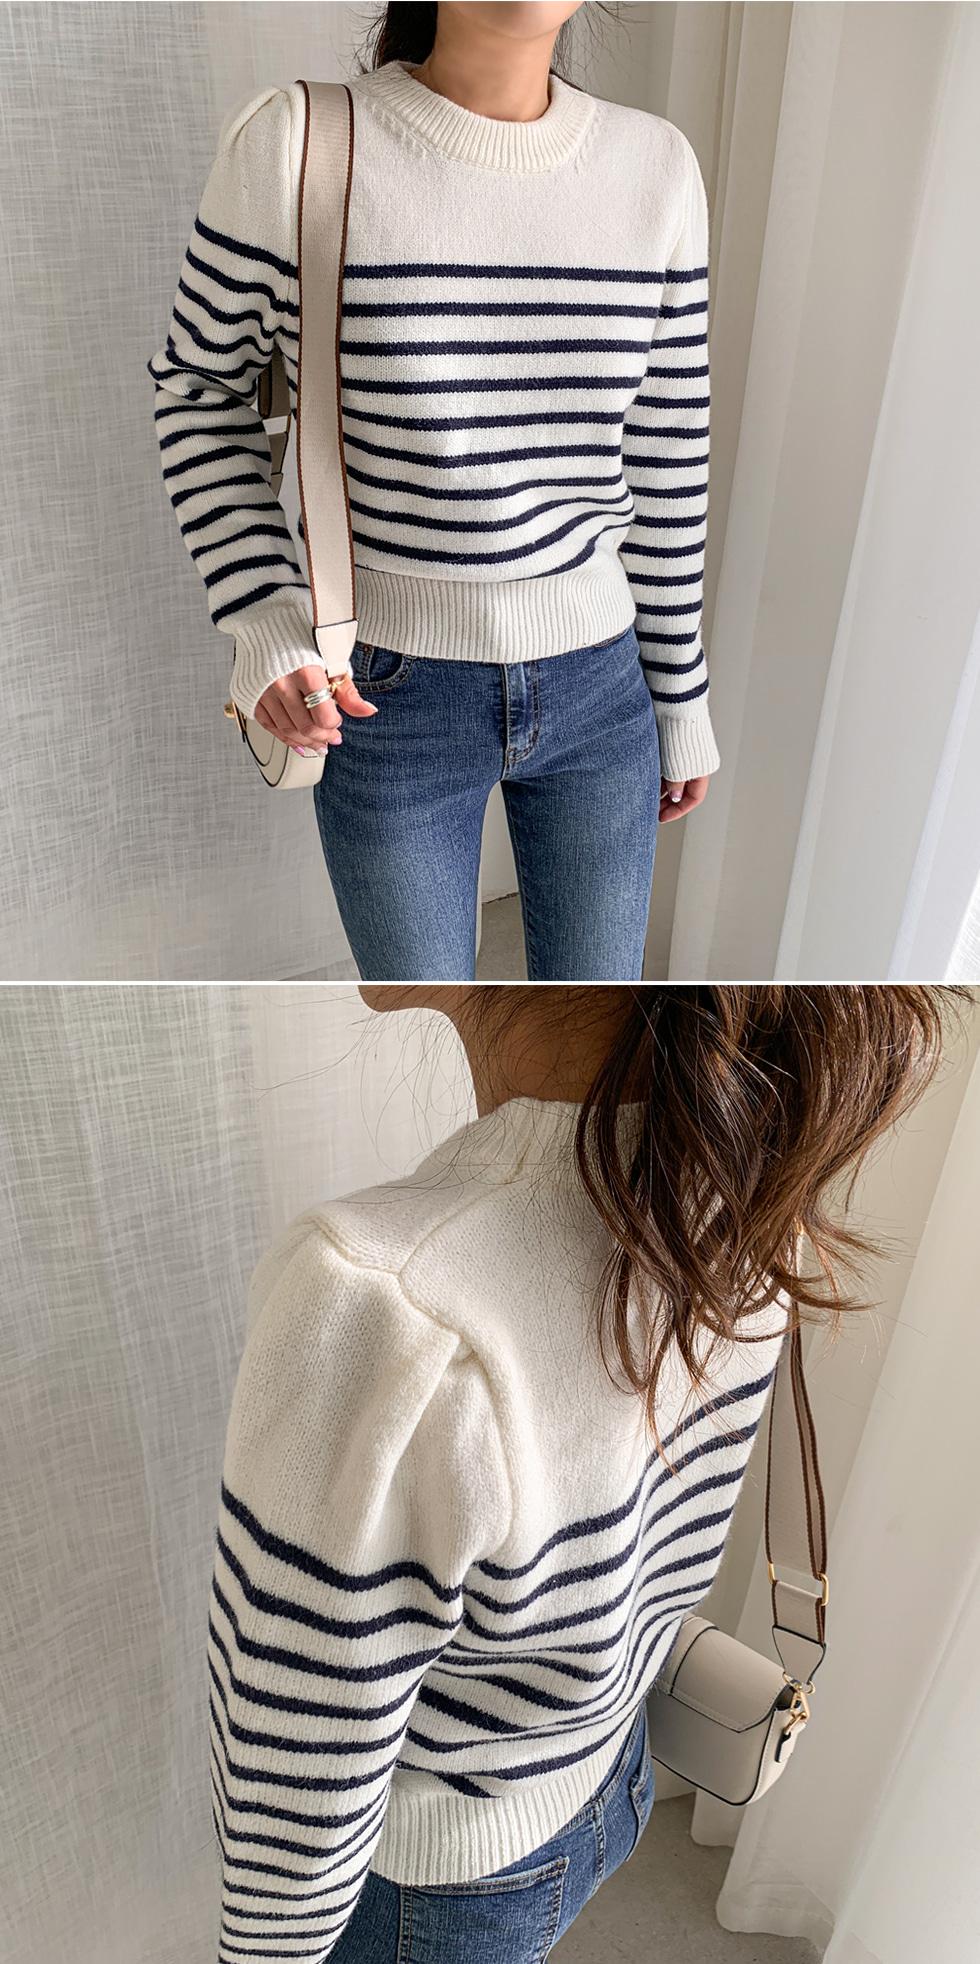 Puff Striped Knitwear